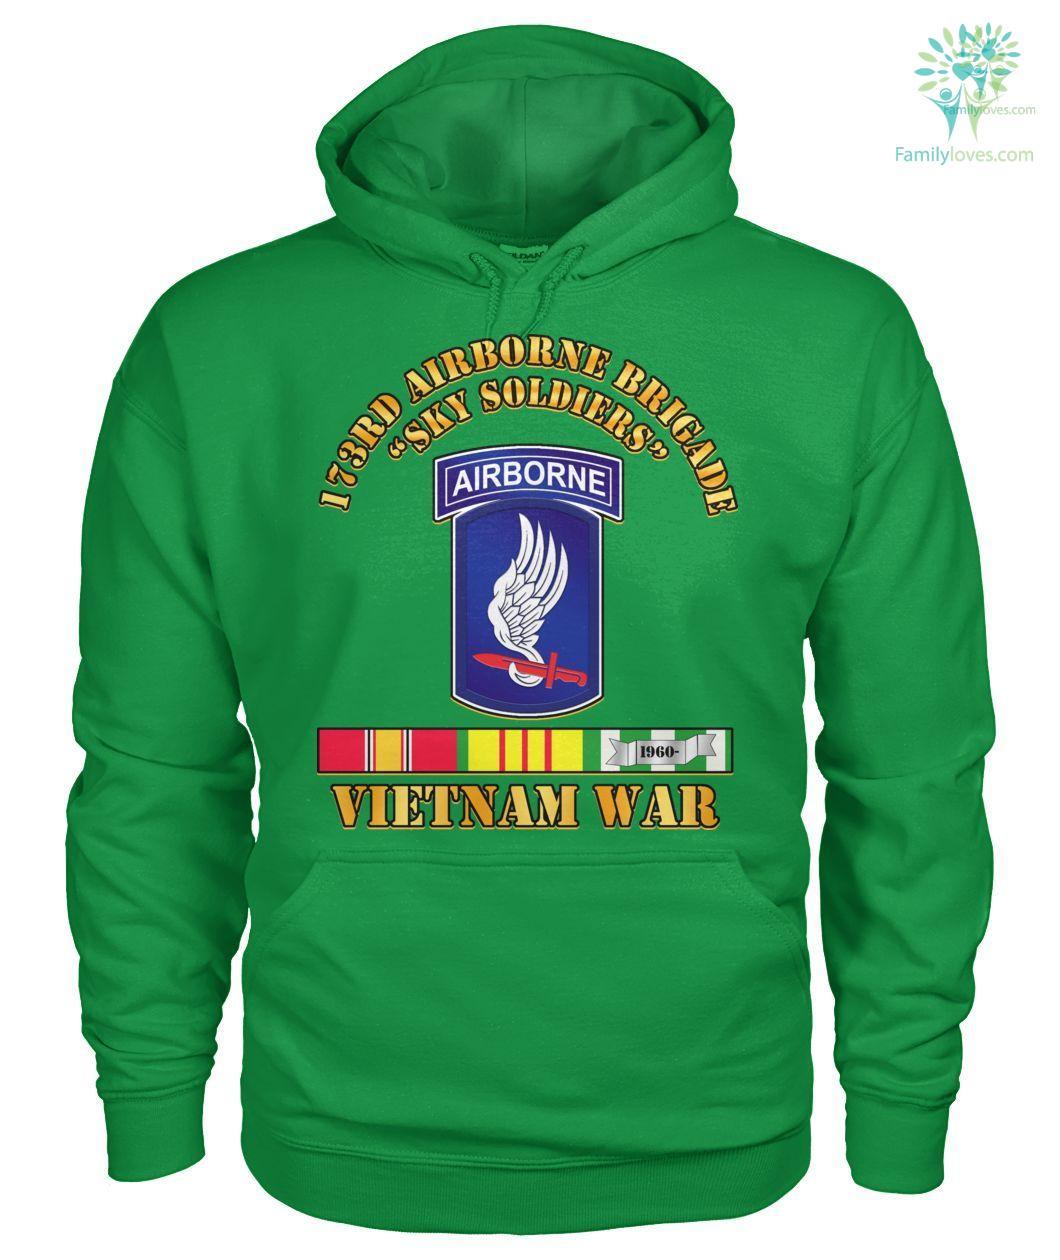 173rd-airborne-brigade_9713d9a0-c378-195a-03e2-ba4607191397 173rd Airborne Brigade sky soldiers vietnam war hoodie, sweatshirt, t-shirt  %tag